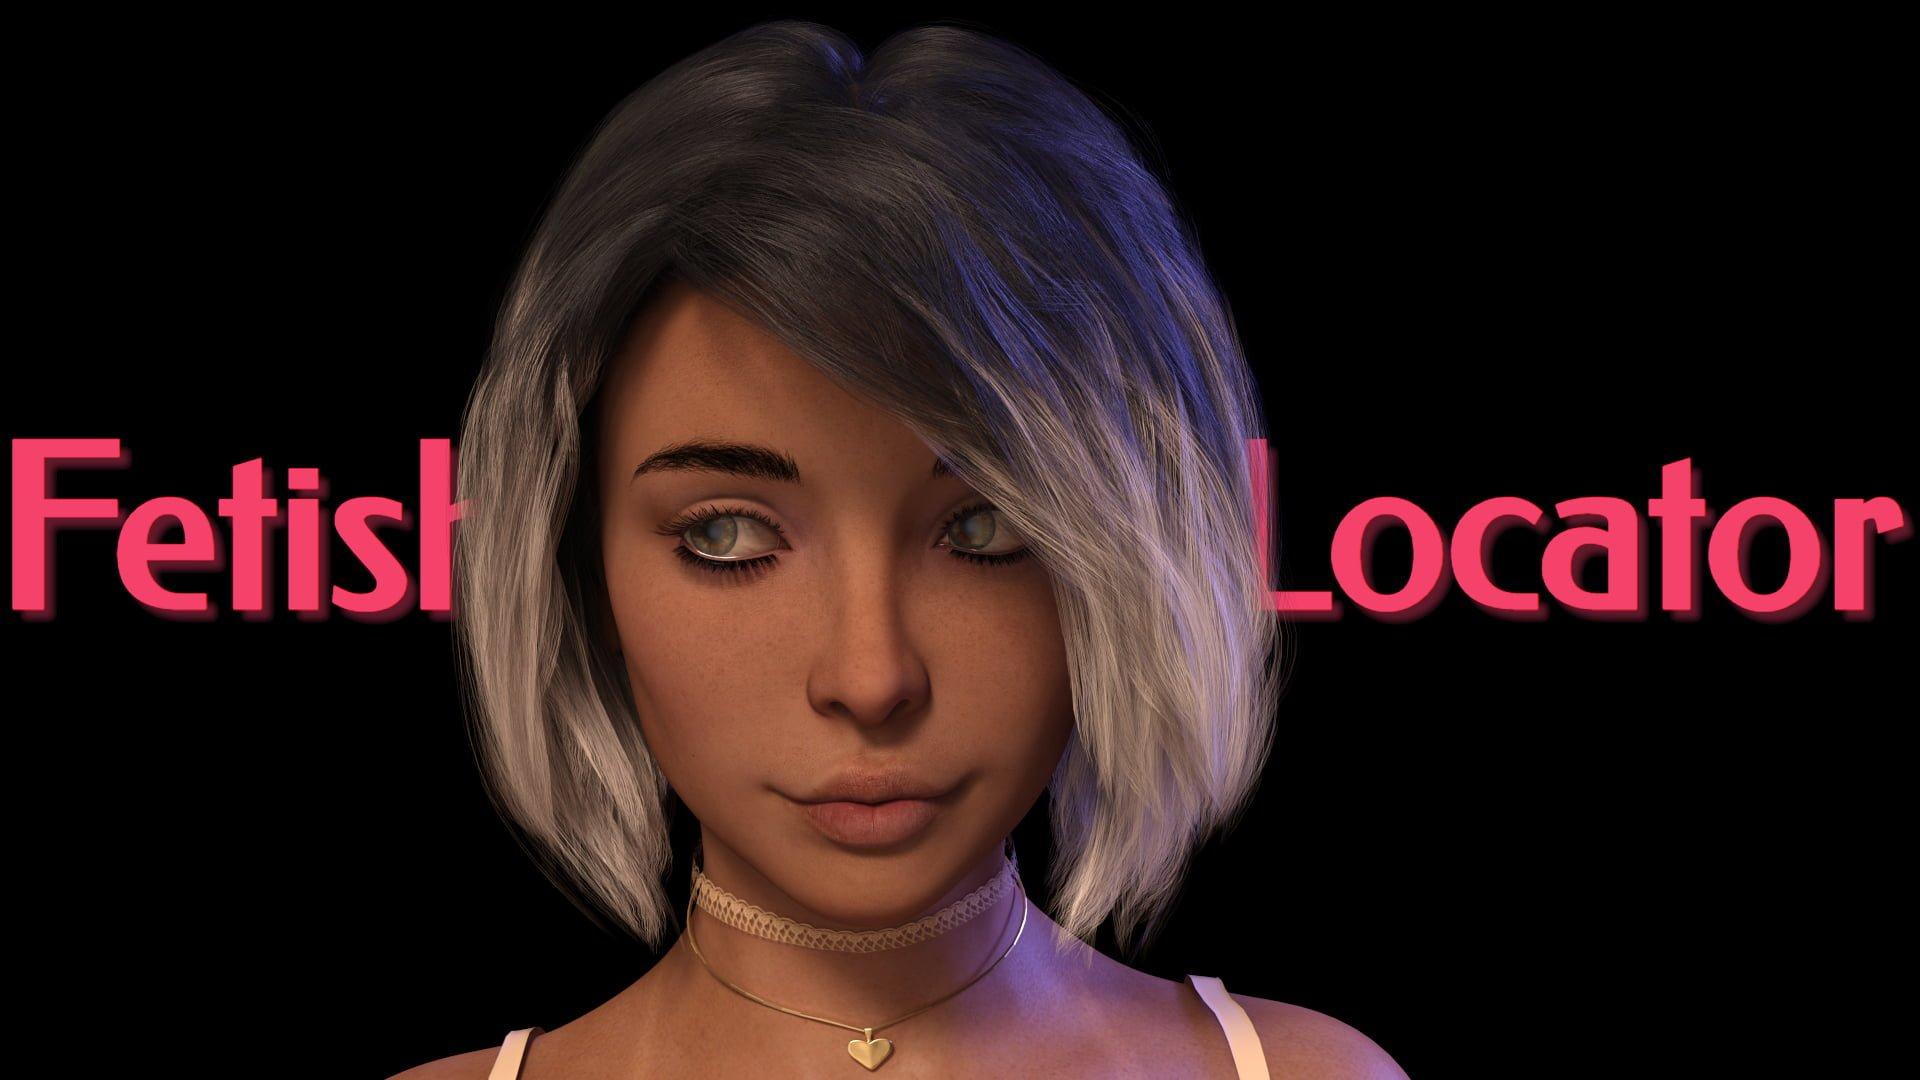 Fetish Locator – Version – 0.07.10 - Free patreon family incest hentai game 3